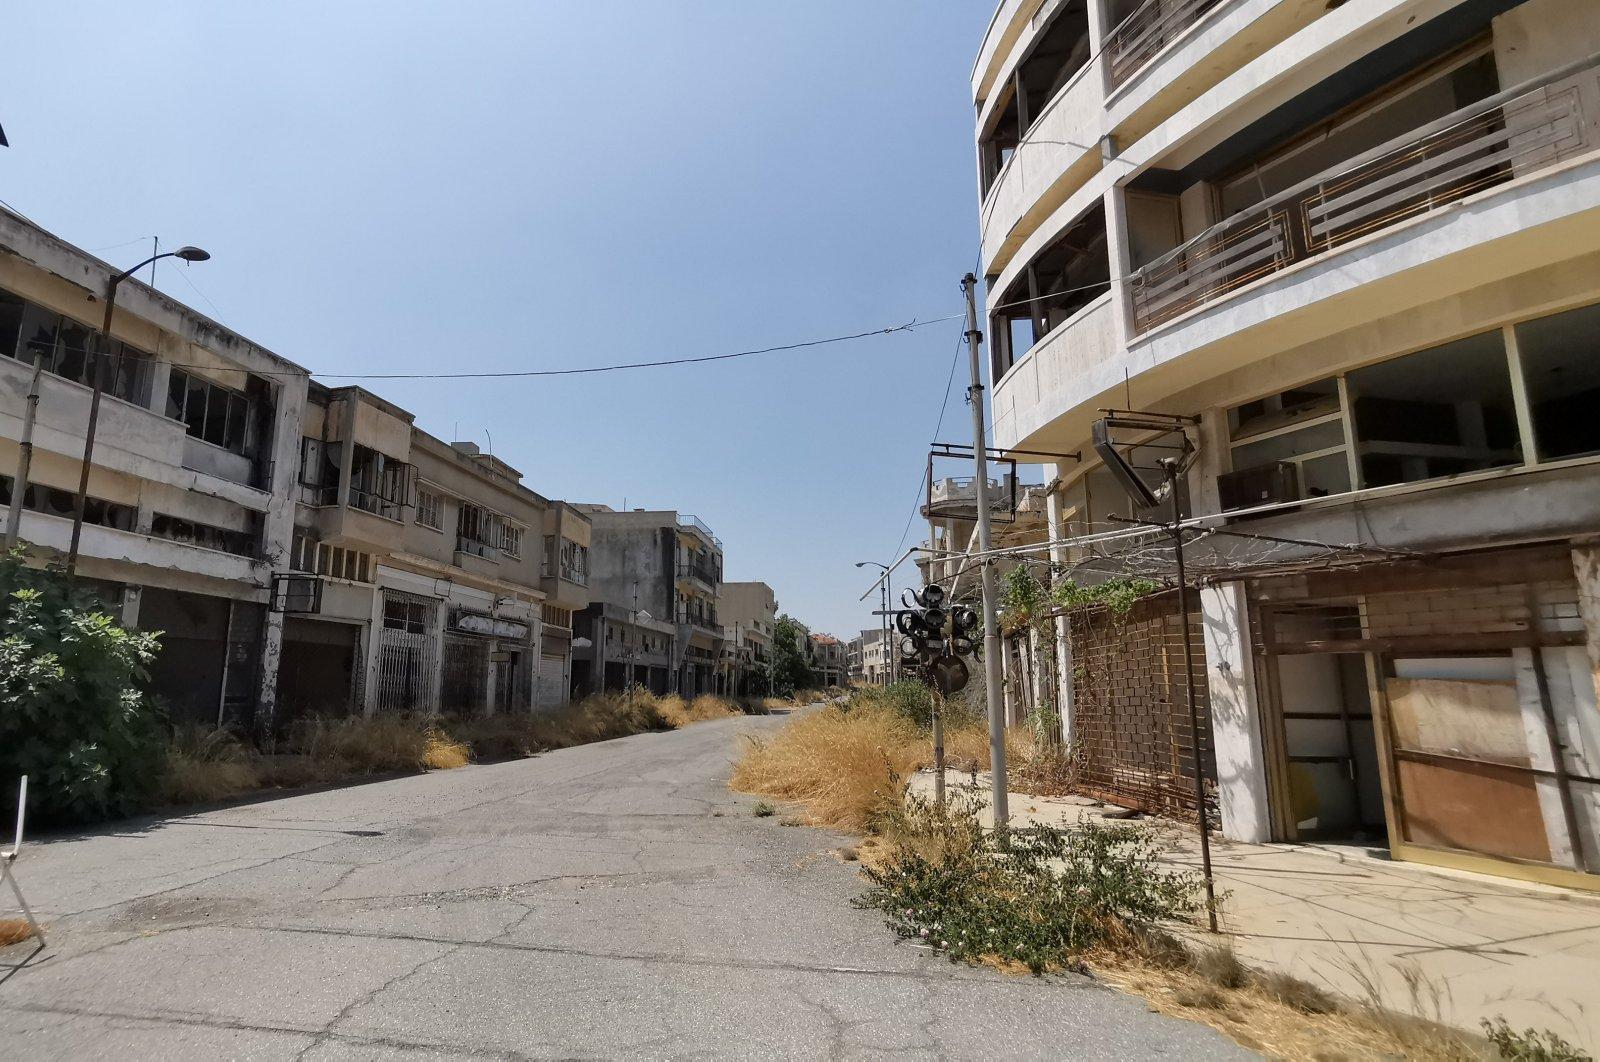 A view of the abandoned town Varosha (Maraş) in northern Cyprus, Sept. 2, 2019. (İHA Photo)